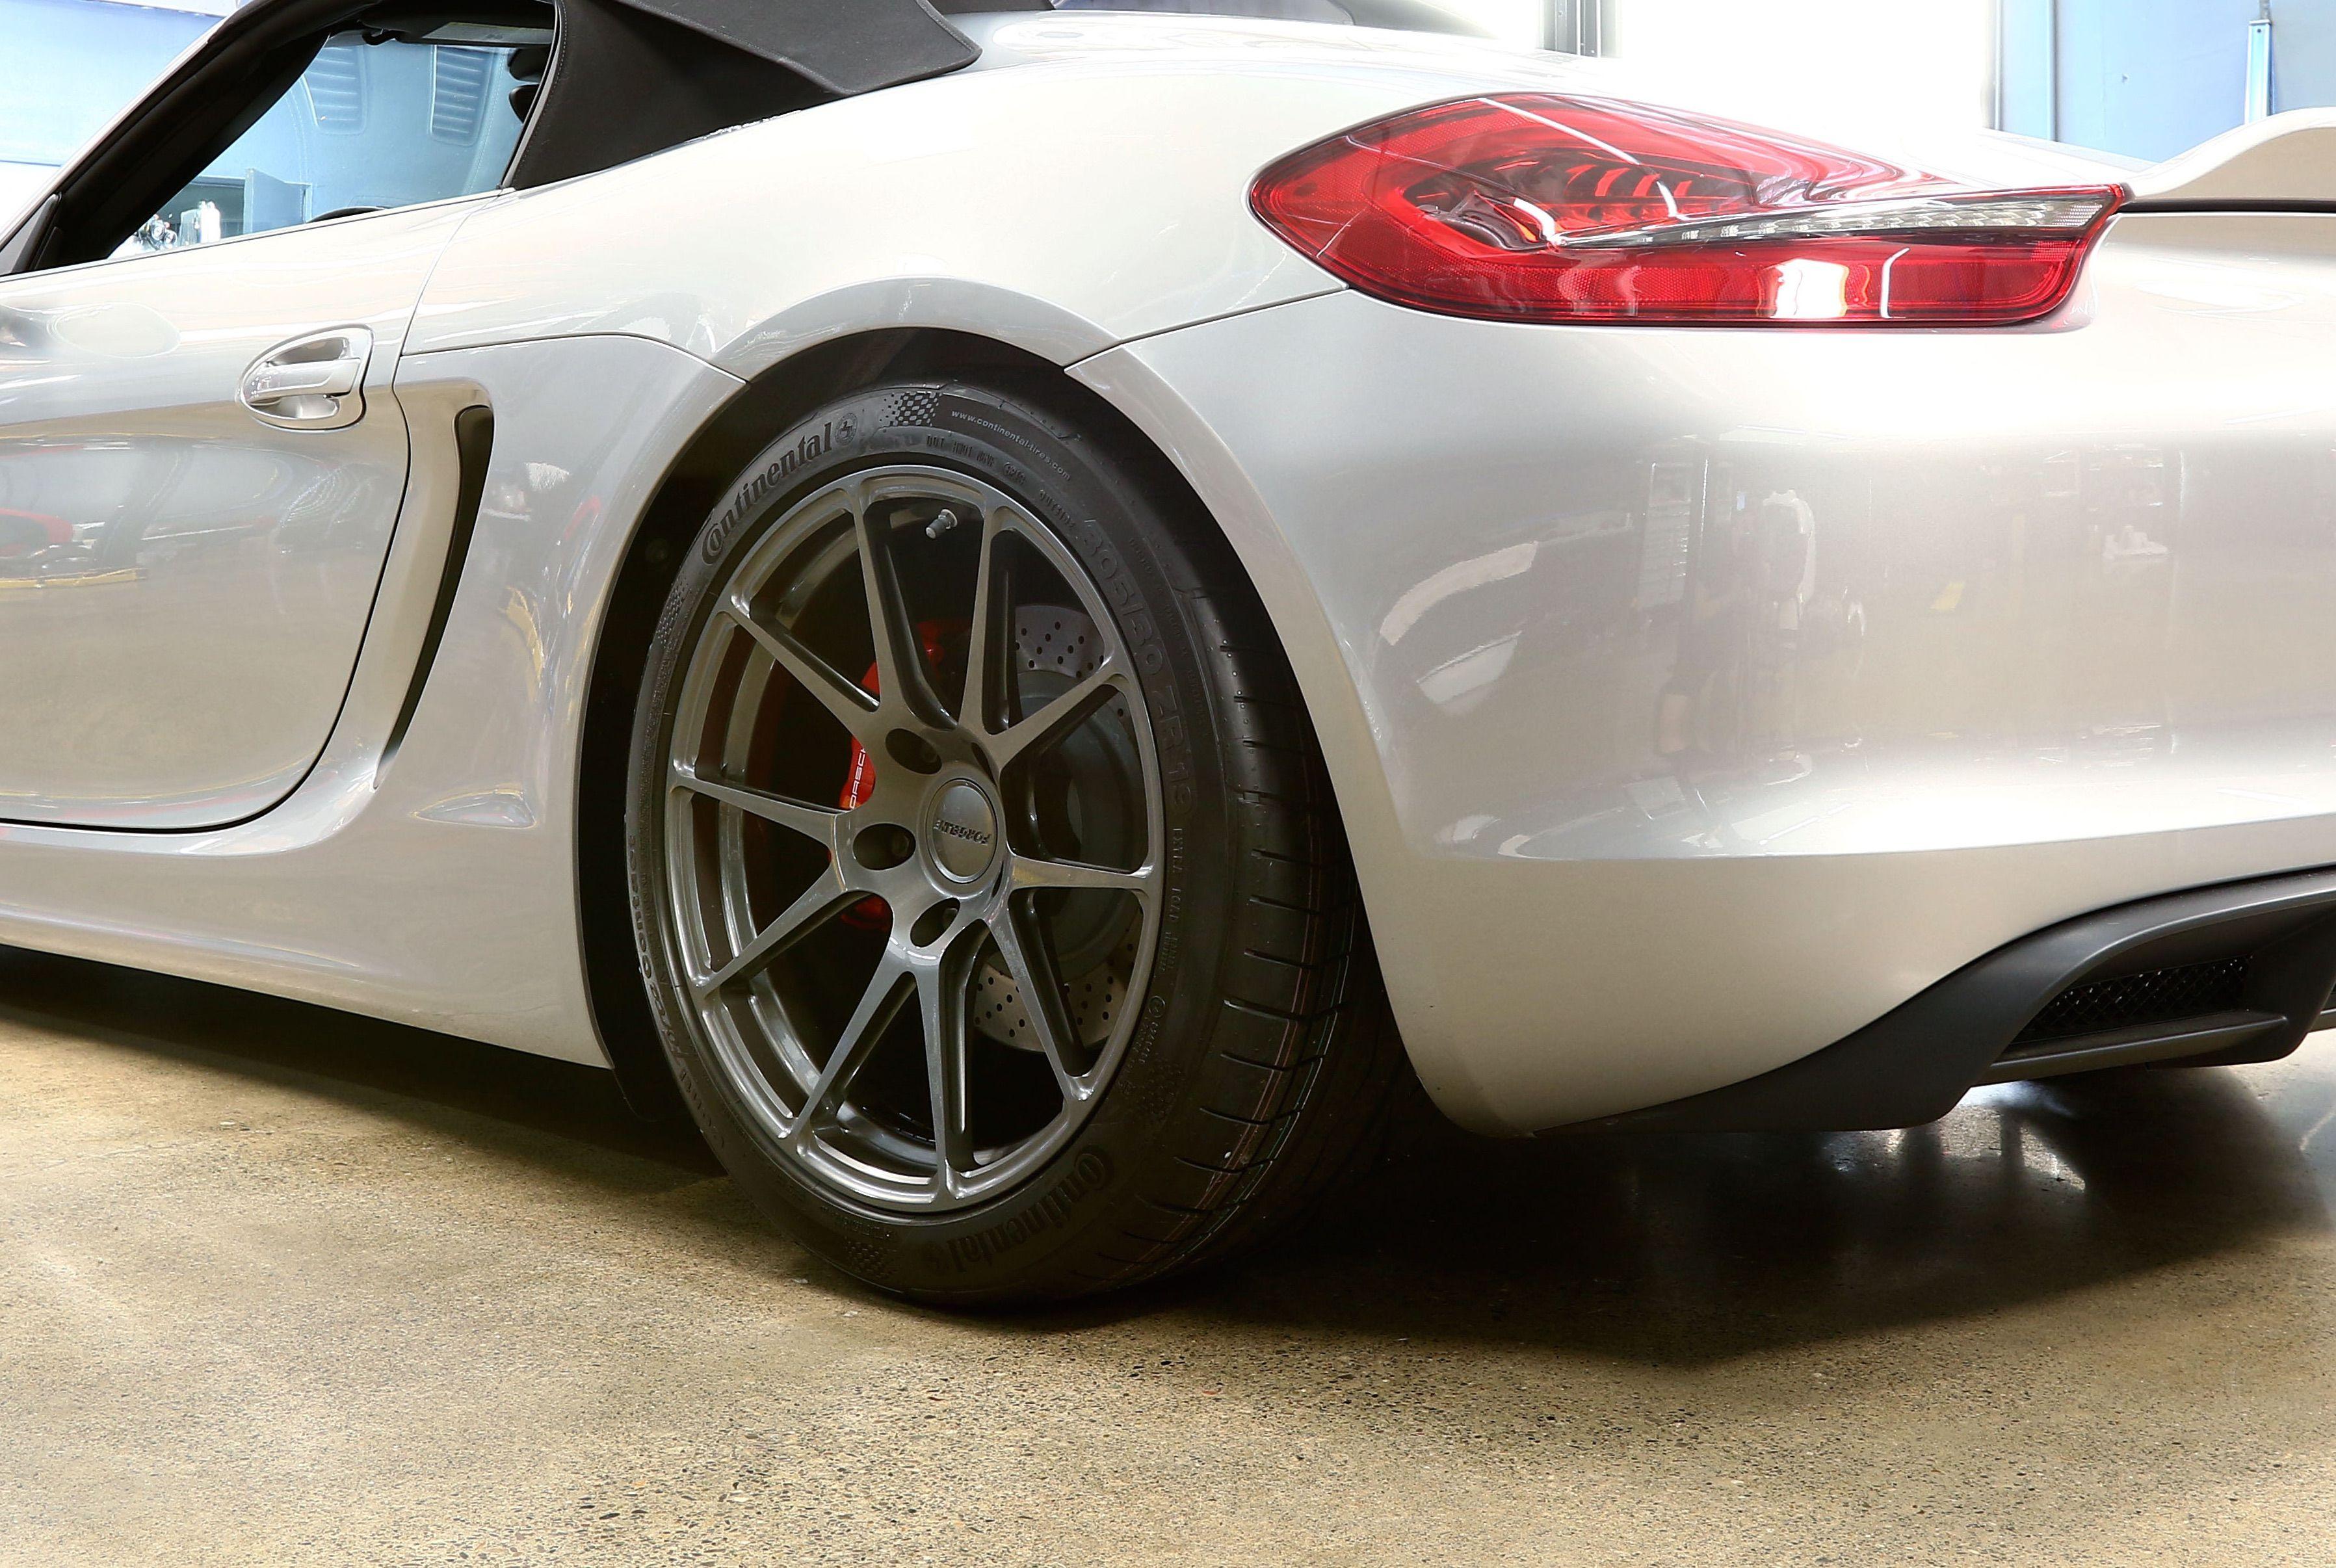 a638672683320b1f233bdaf7ddc057c5 Marvelous Porsche 918 Spyder Hybrid Prezzo Cars Trend